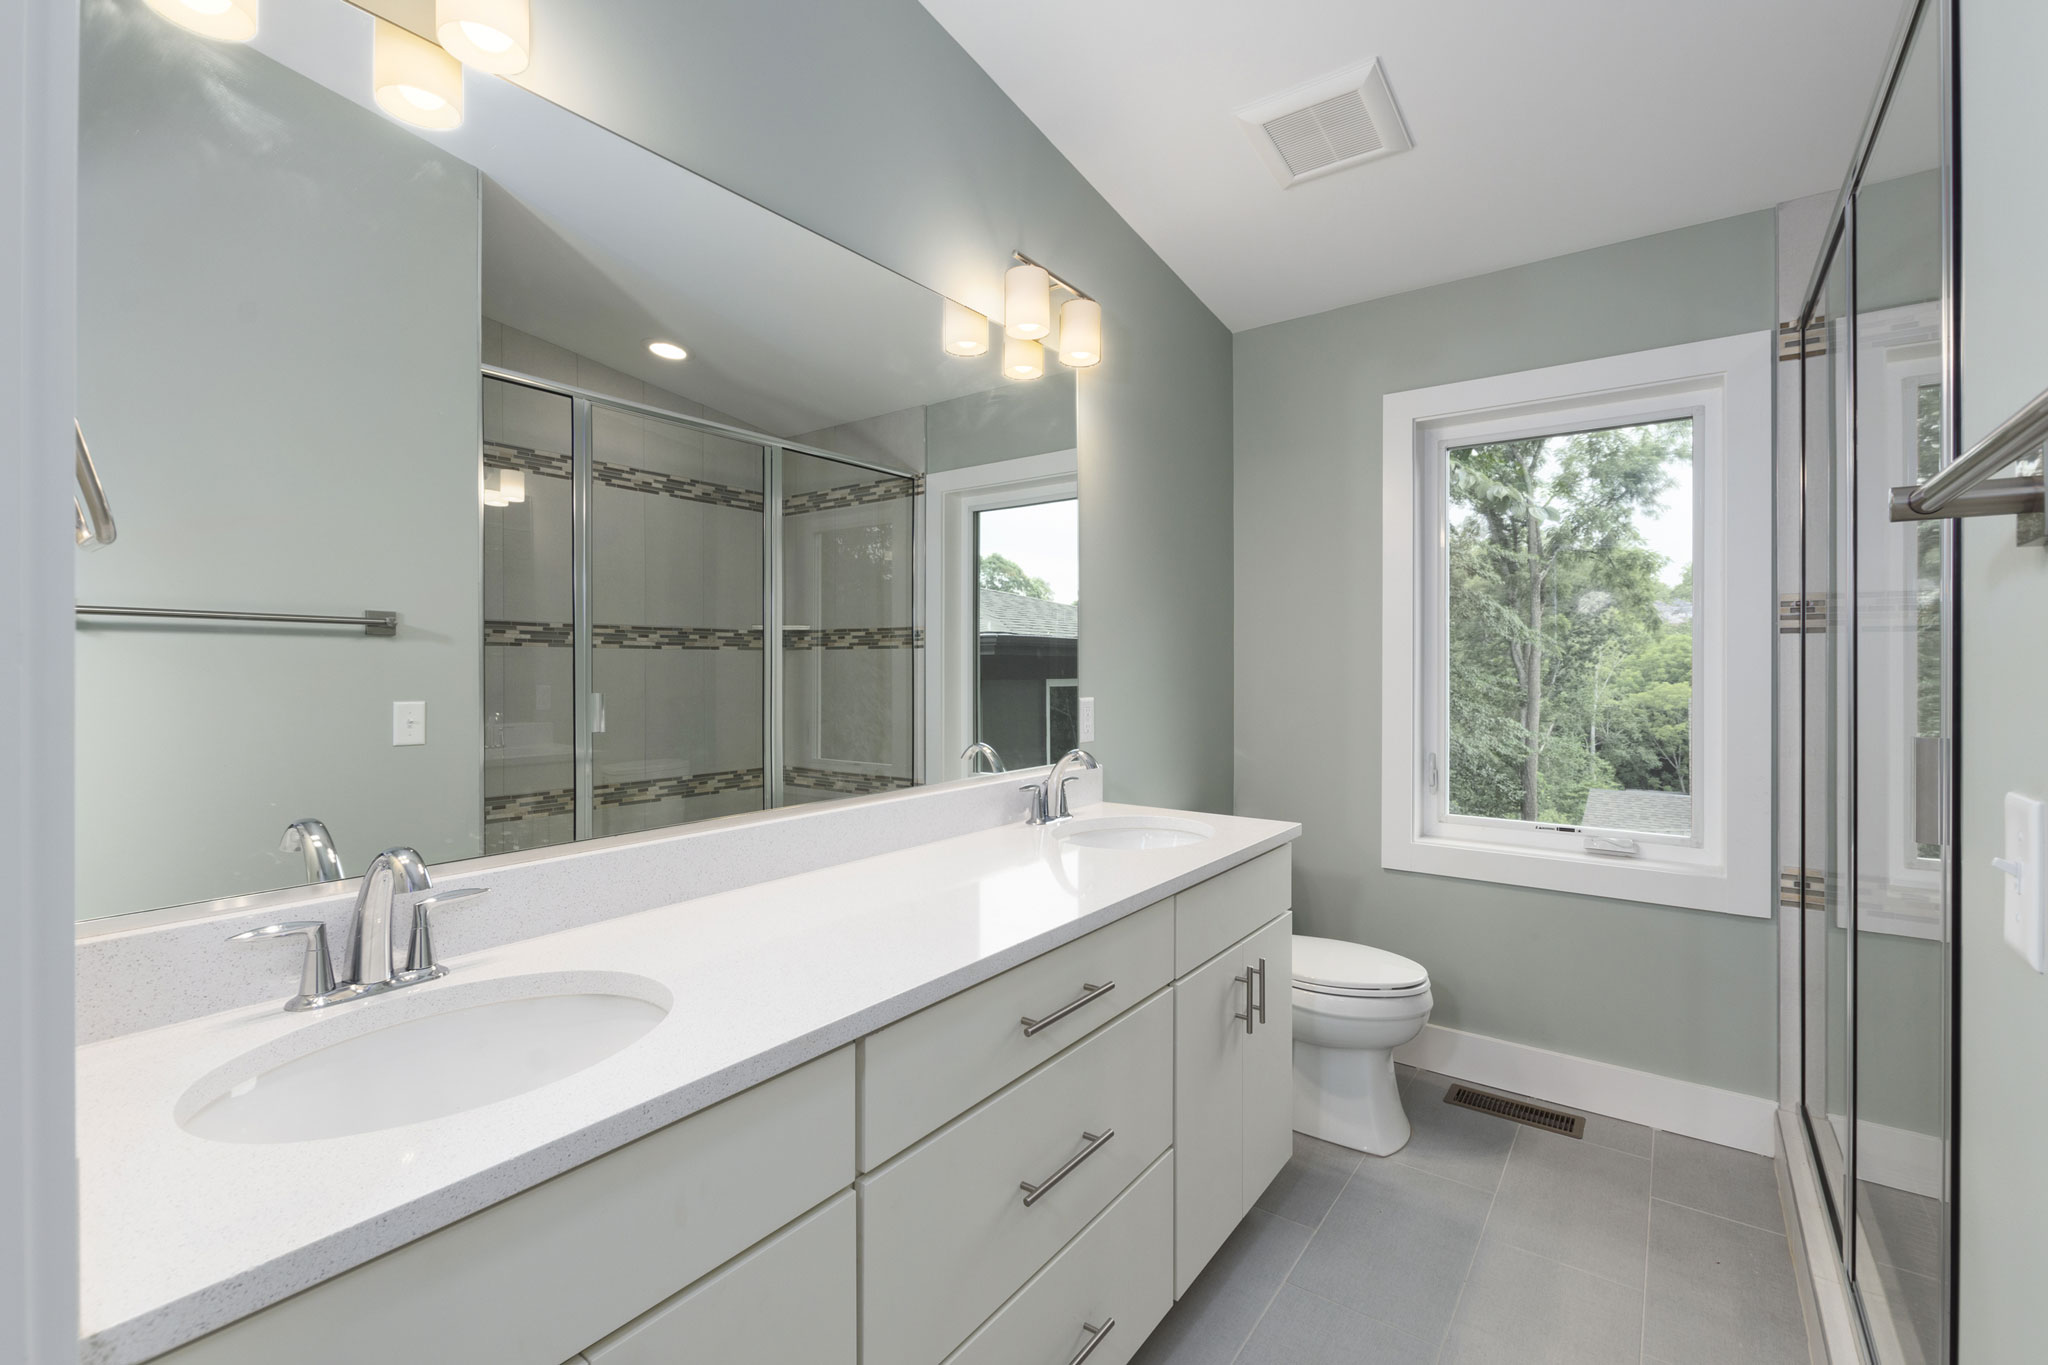 Master Bathroom with Quartz Double Vanity and Walk-In Shower.jpg